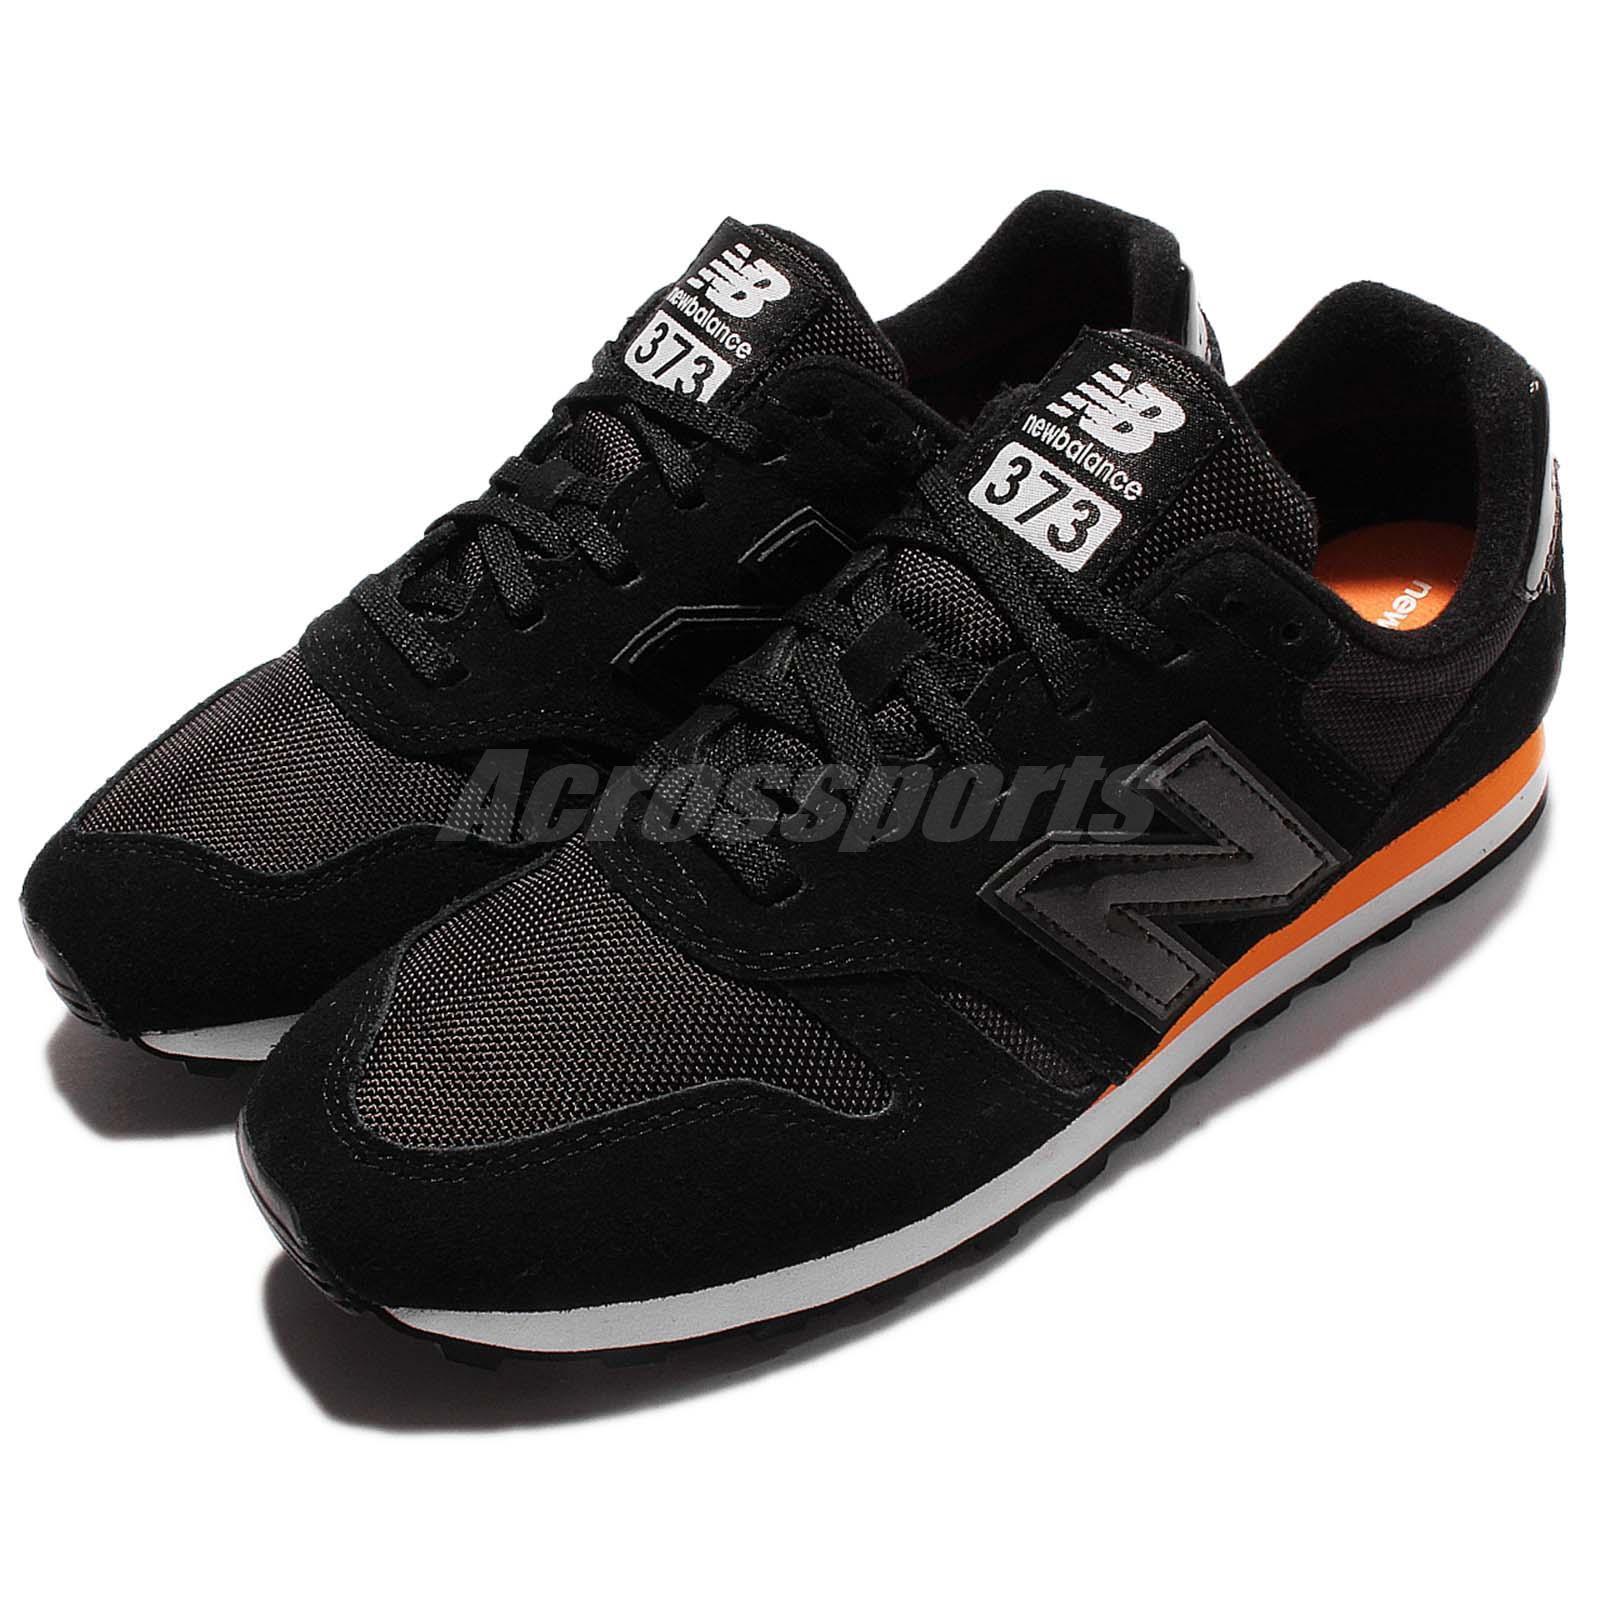 New  Balance ml373mb cortos zapatillas Lifestyle cortos ml373mb ocio zapatillas cortos 0fad42